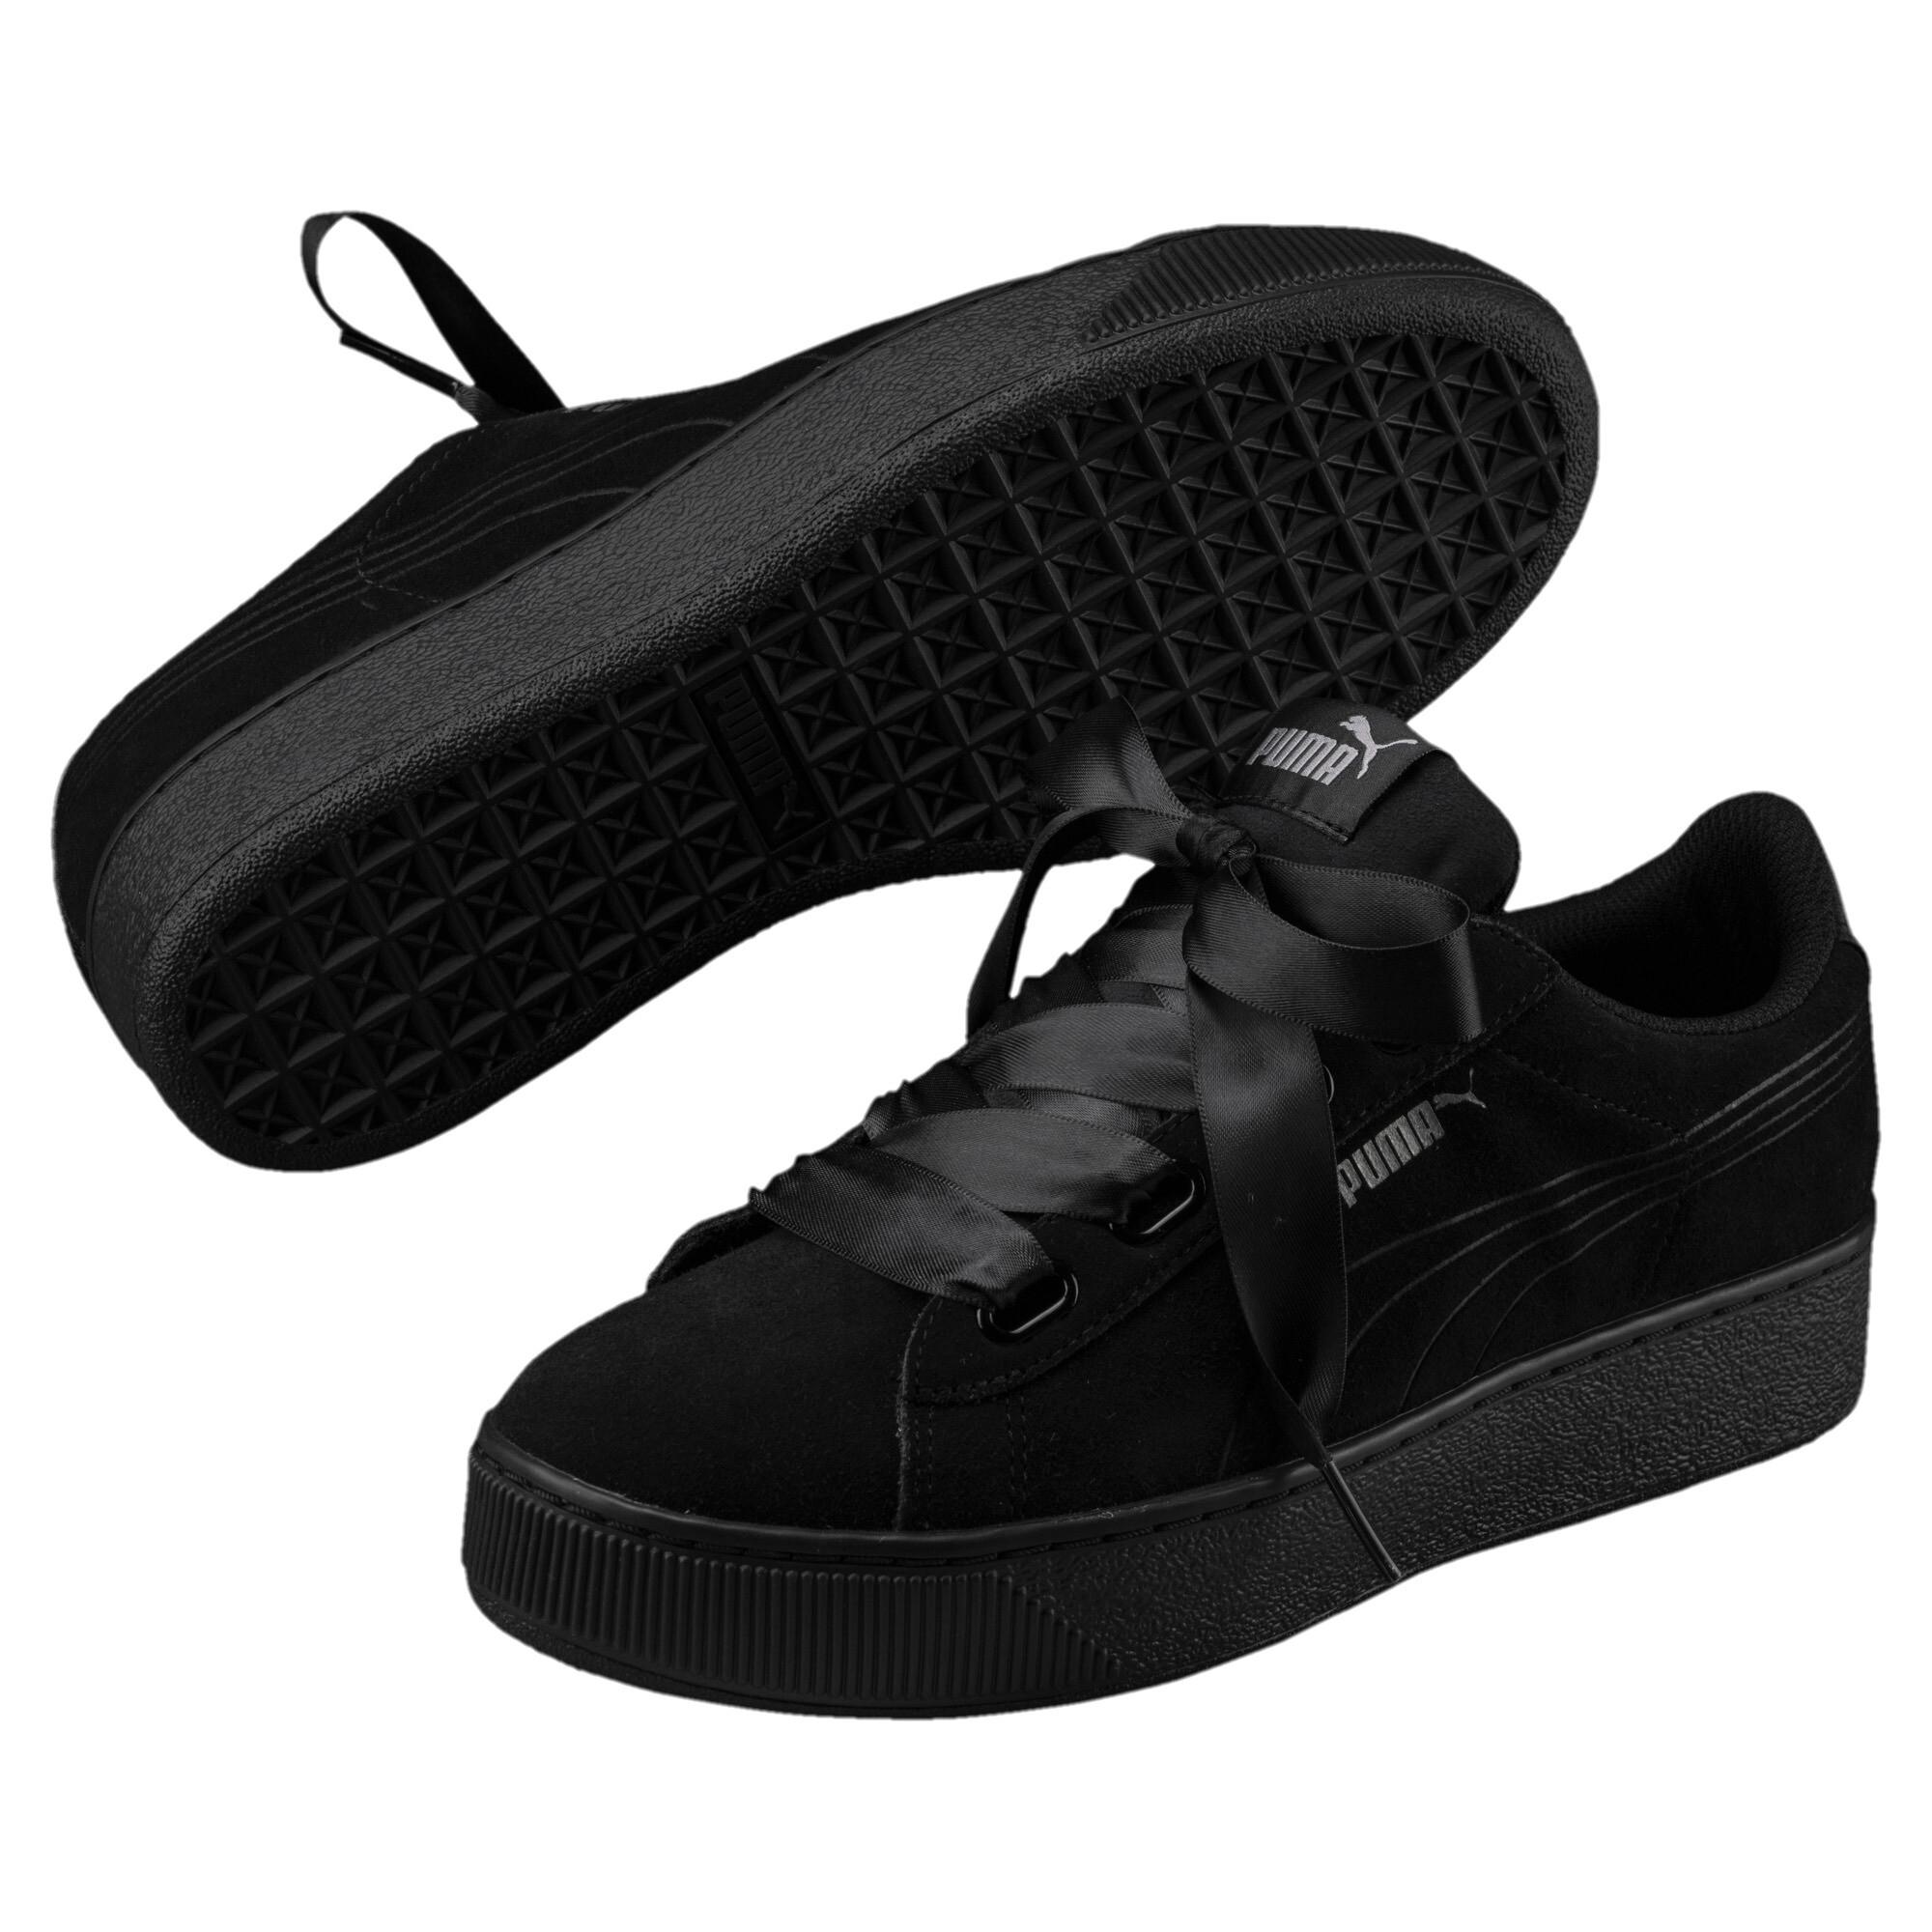 033770840a5 Vikky Platform Ribbon Womens' Sneakers | 10 - Black | Puma